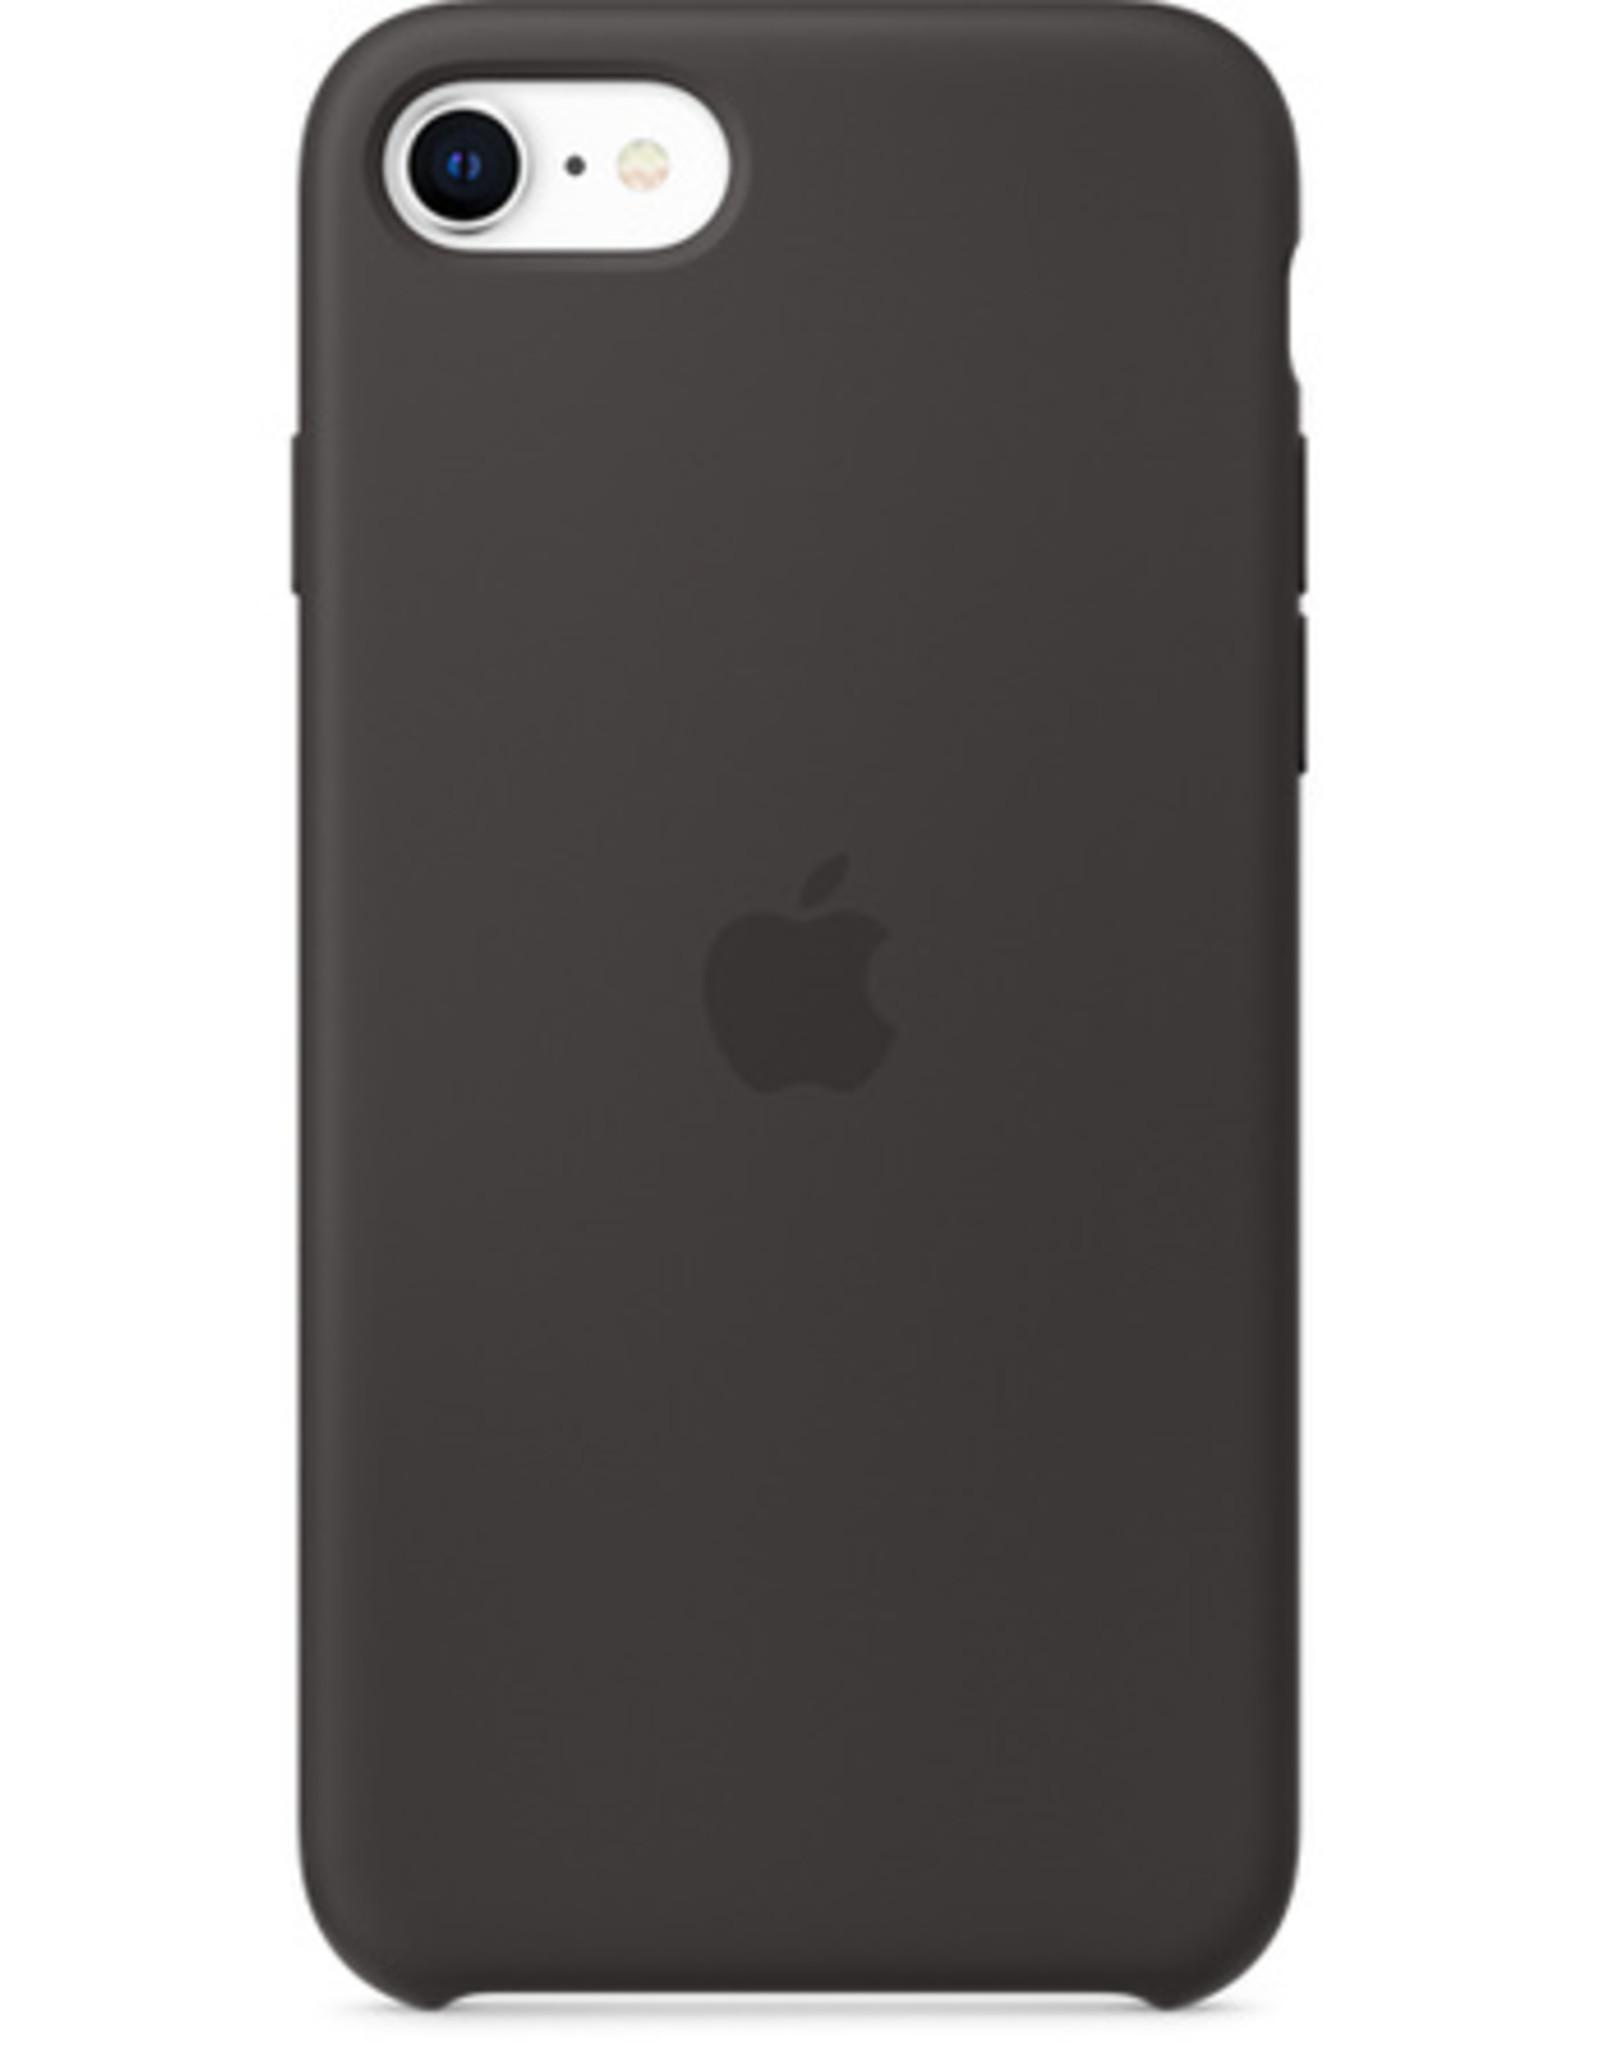 Apple Black iPhone Silicone Case